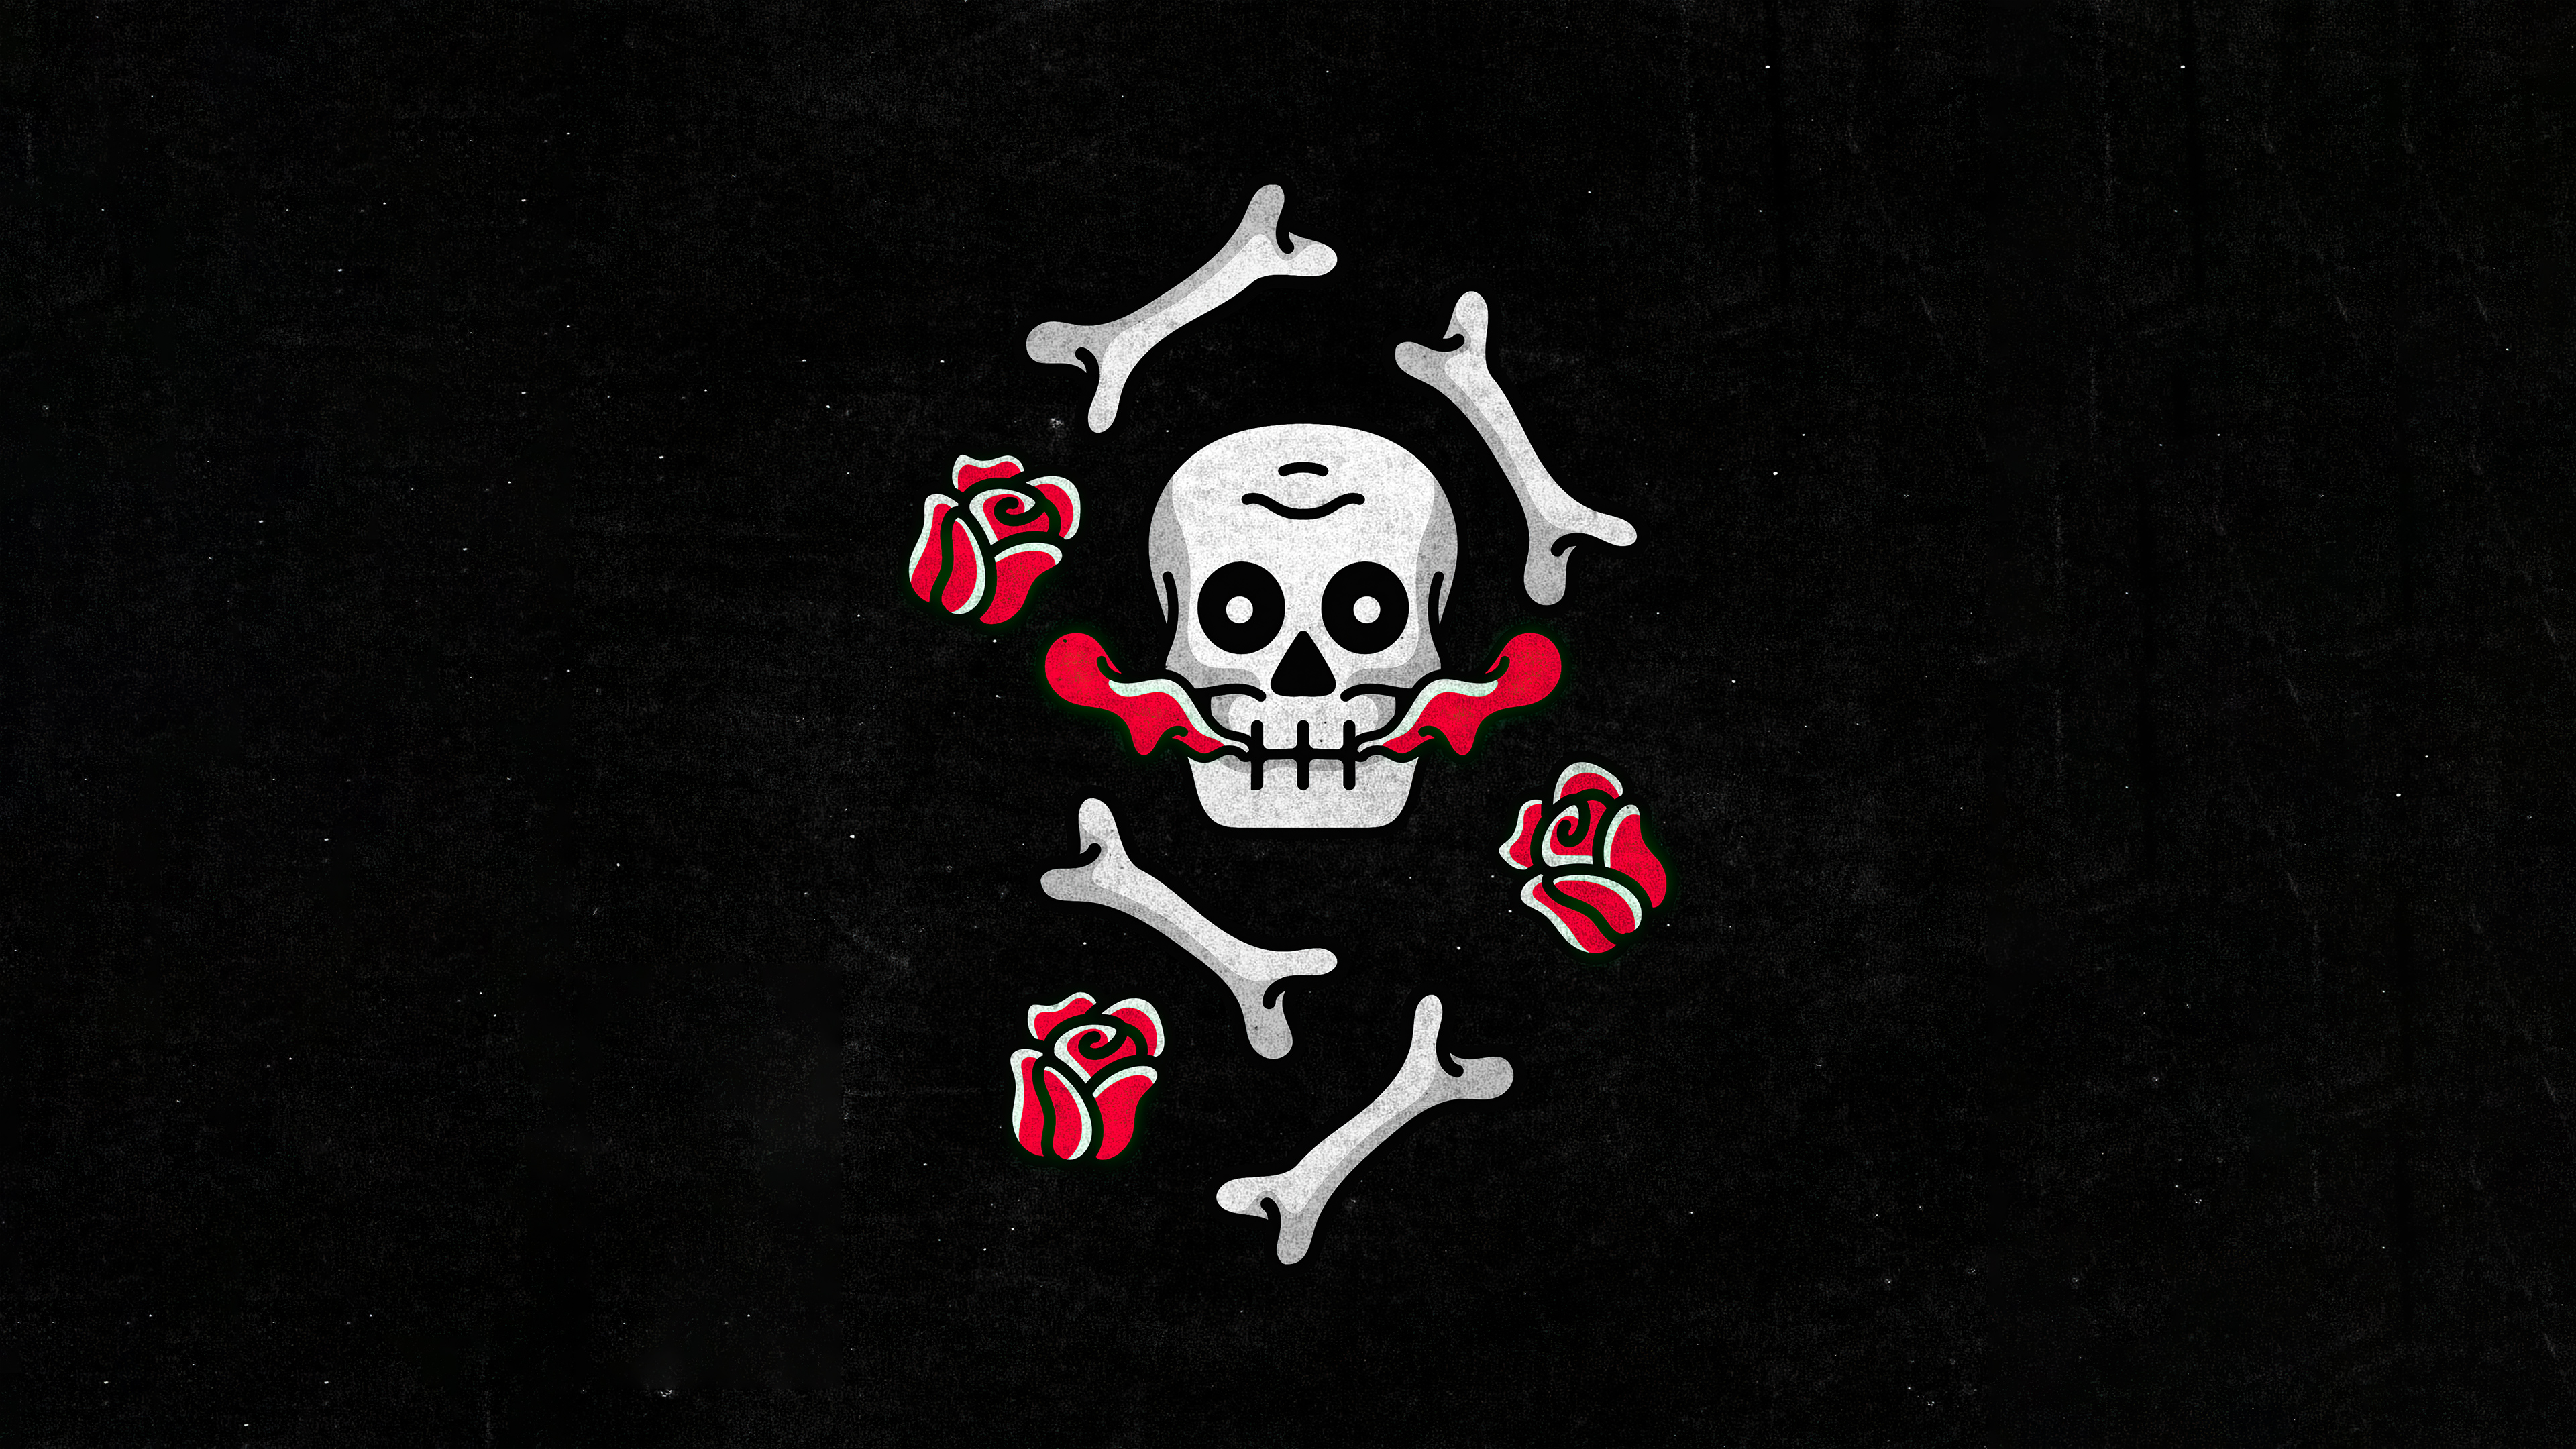 skull and roses dark minimal 4k 1634170457 - Skull And Roses Dark Minimal 4k - Skull And Roses Dark Minimal wallpapers, Skull And Roses Dark Minimal 4k wallpapers